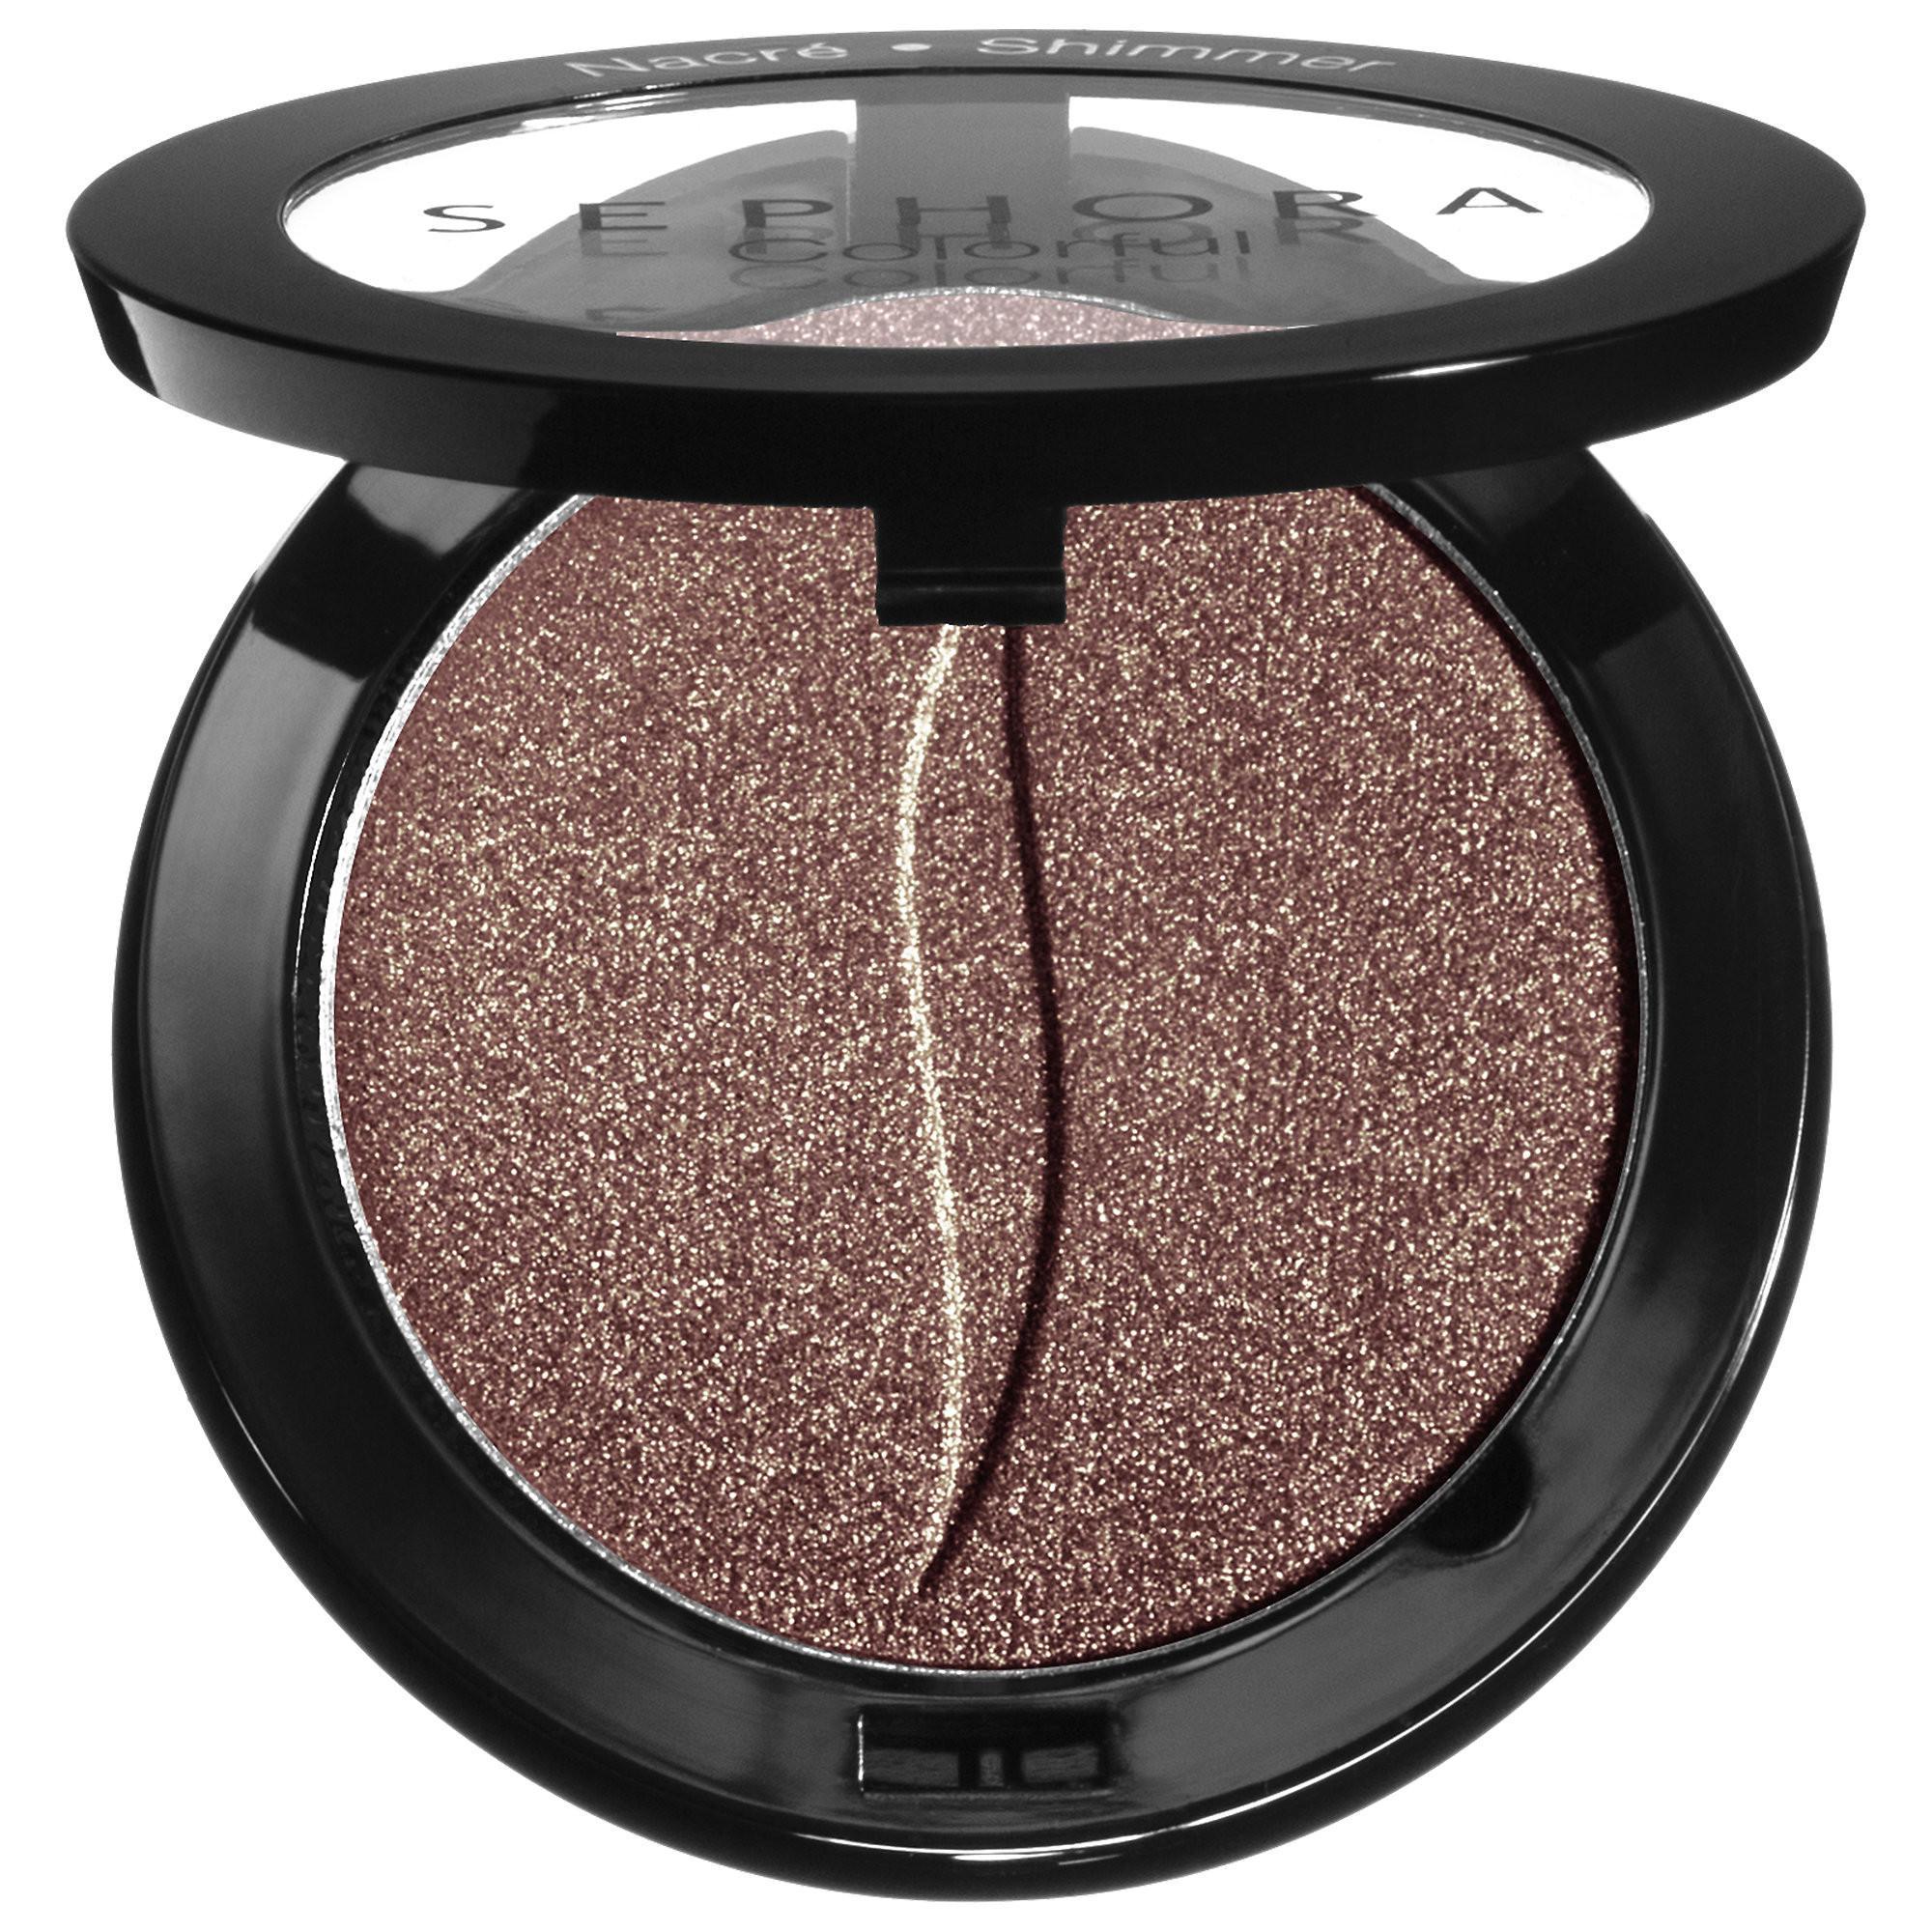 Sephora Colorful Glitter Eyeshadow Choco Excess No. 297